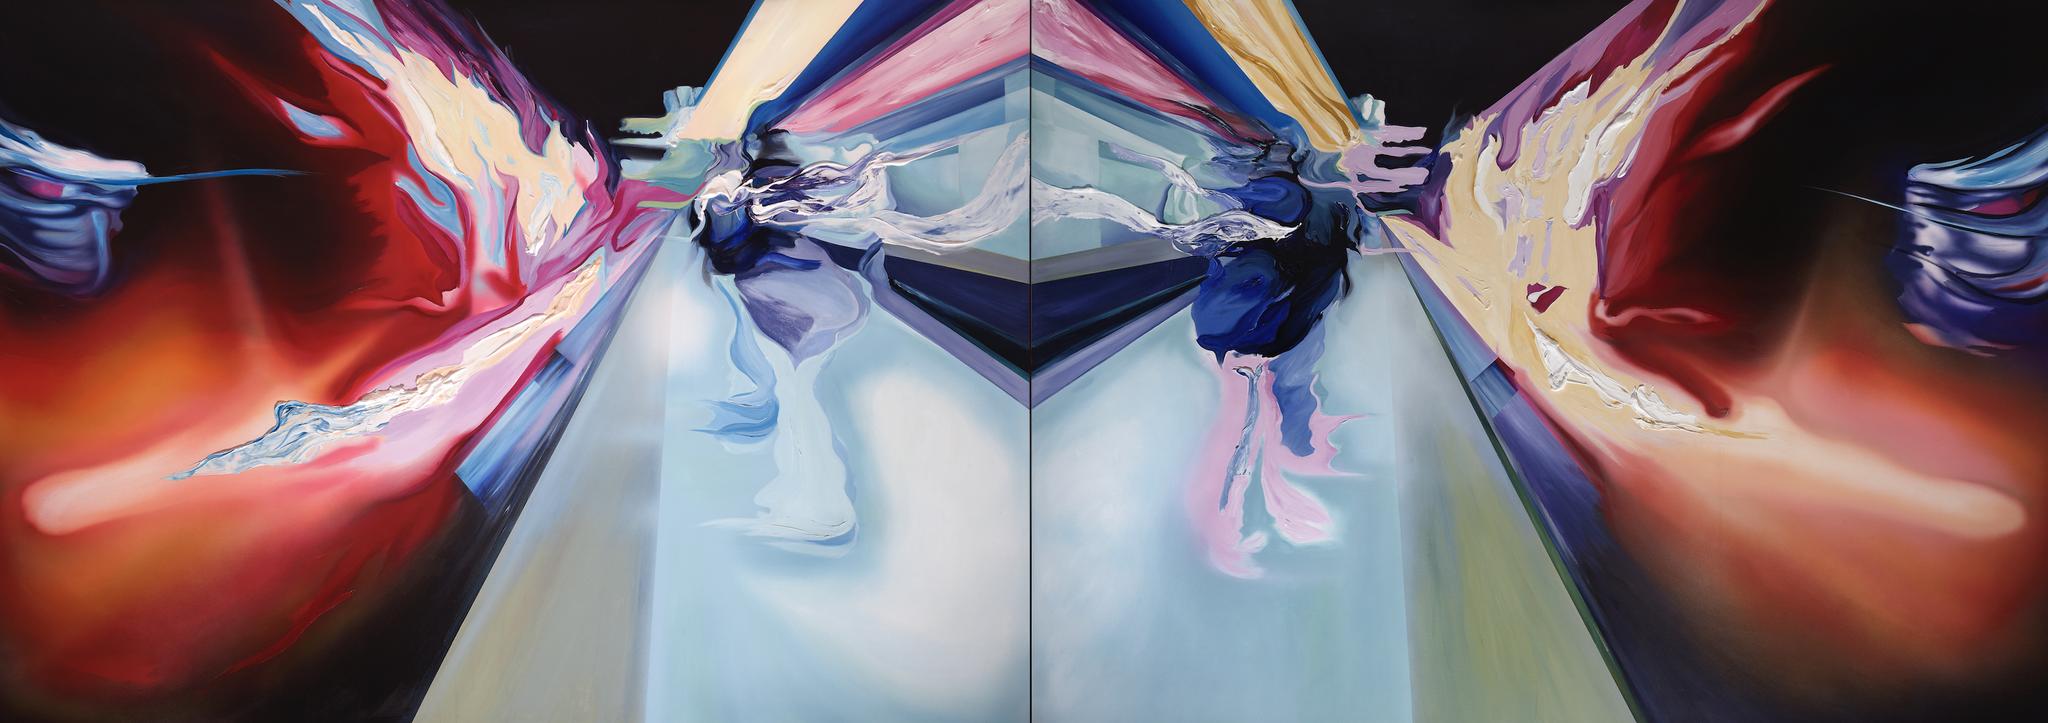 Icaro Diptico 180 cm x 500 cm Acryl auf Leinwand 2011